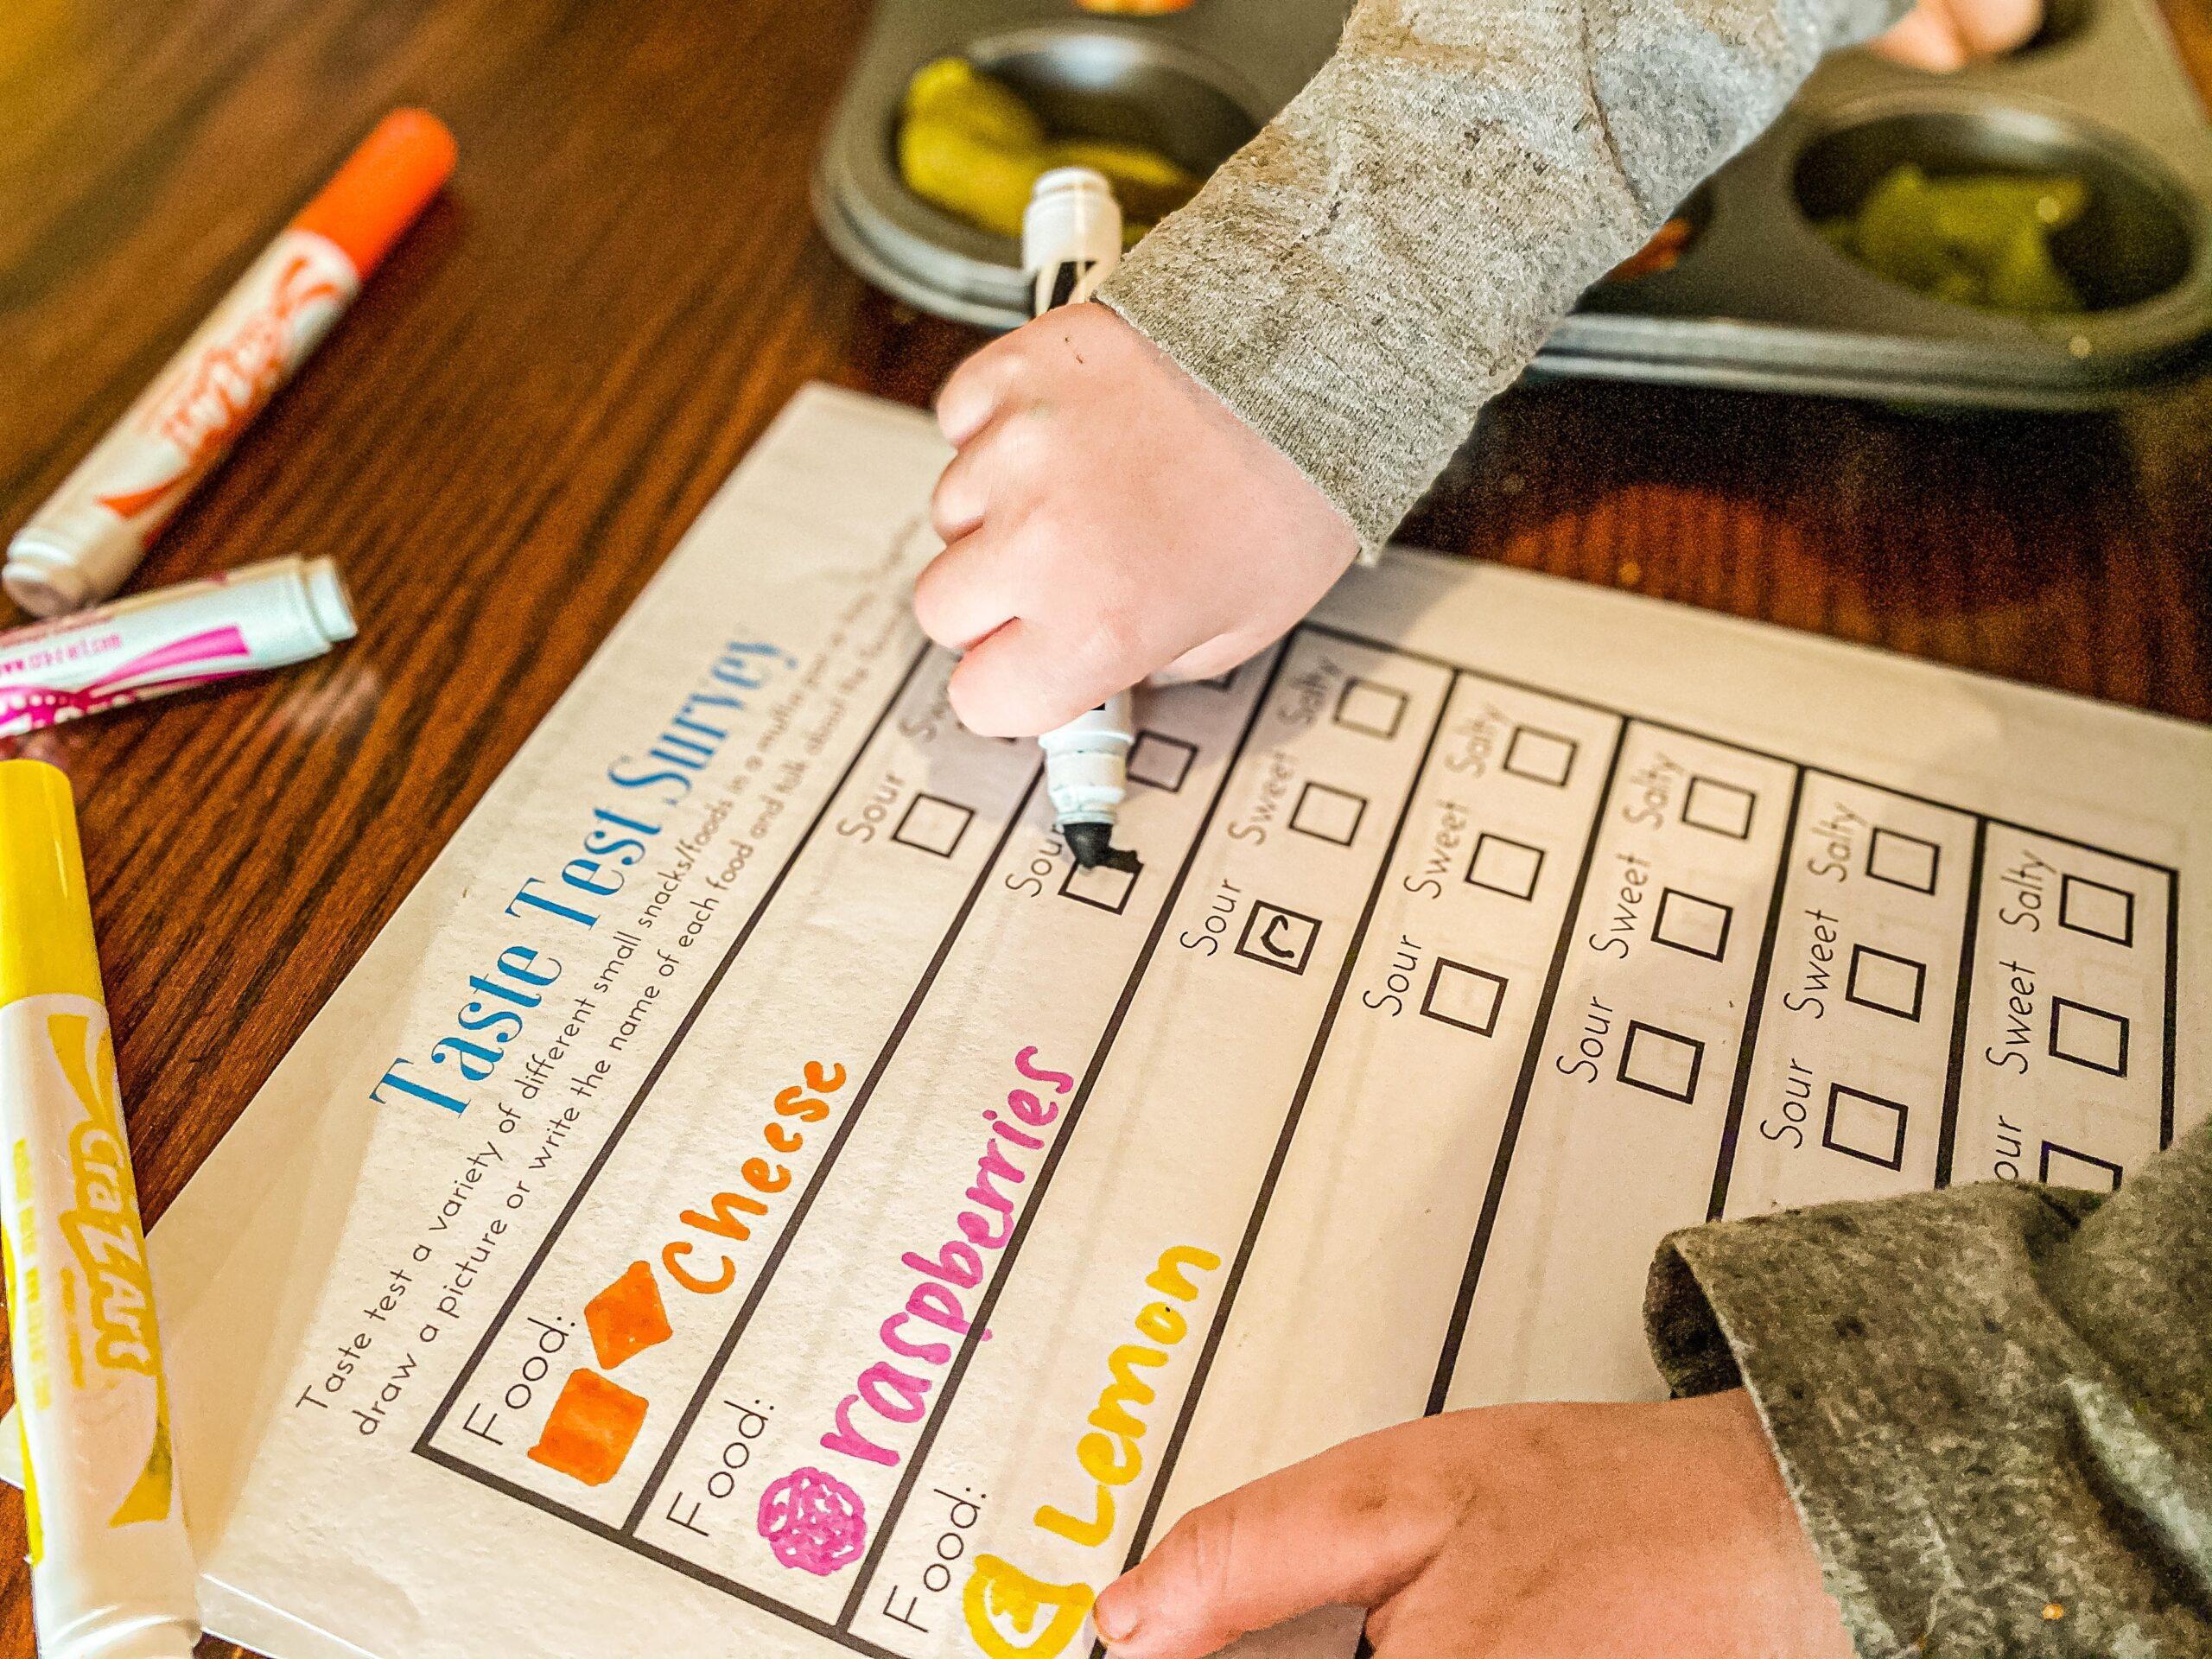 5 Senses Activity: Taste Test Survey Printable